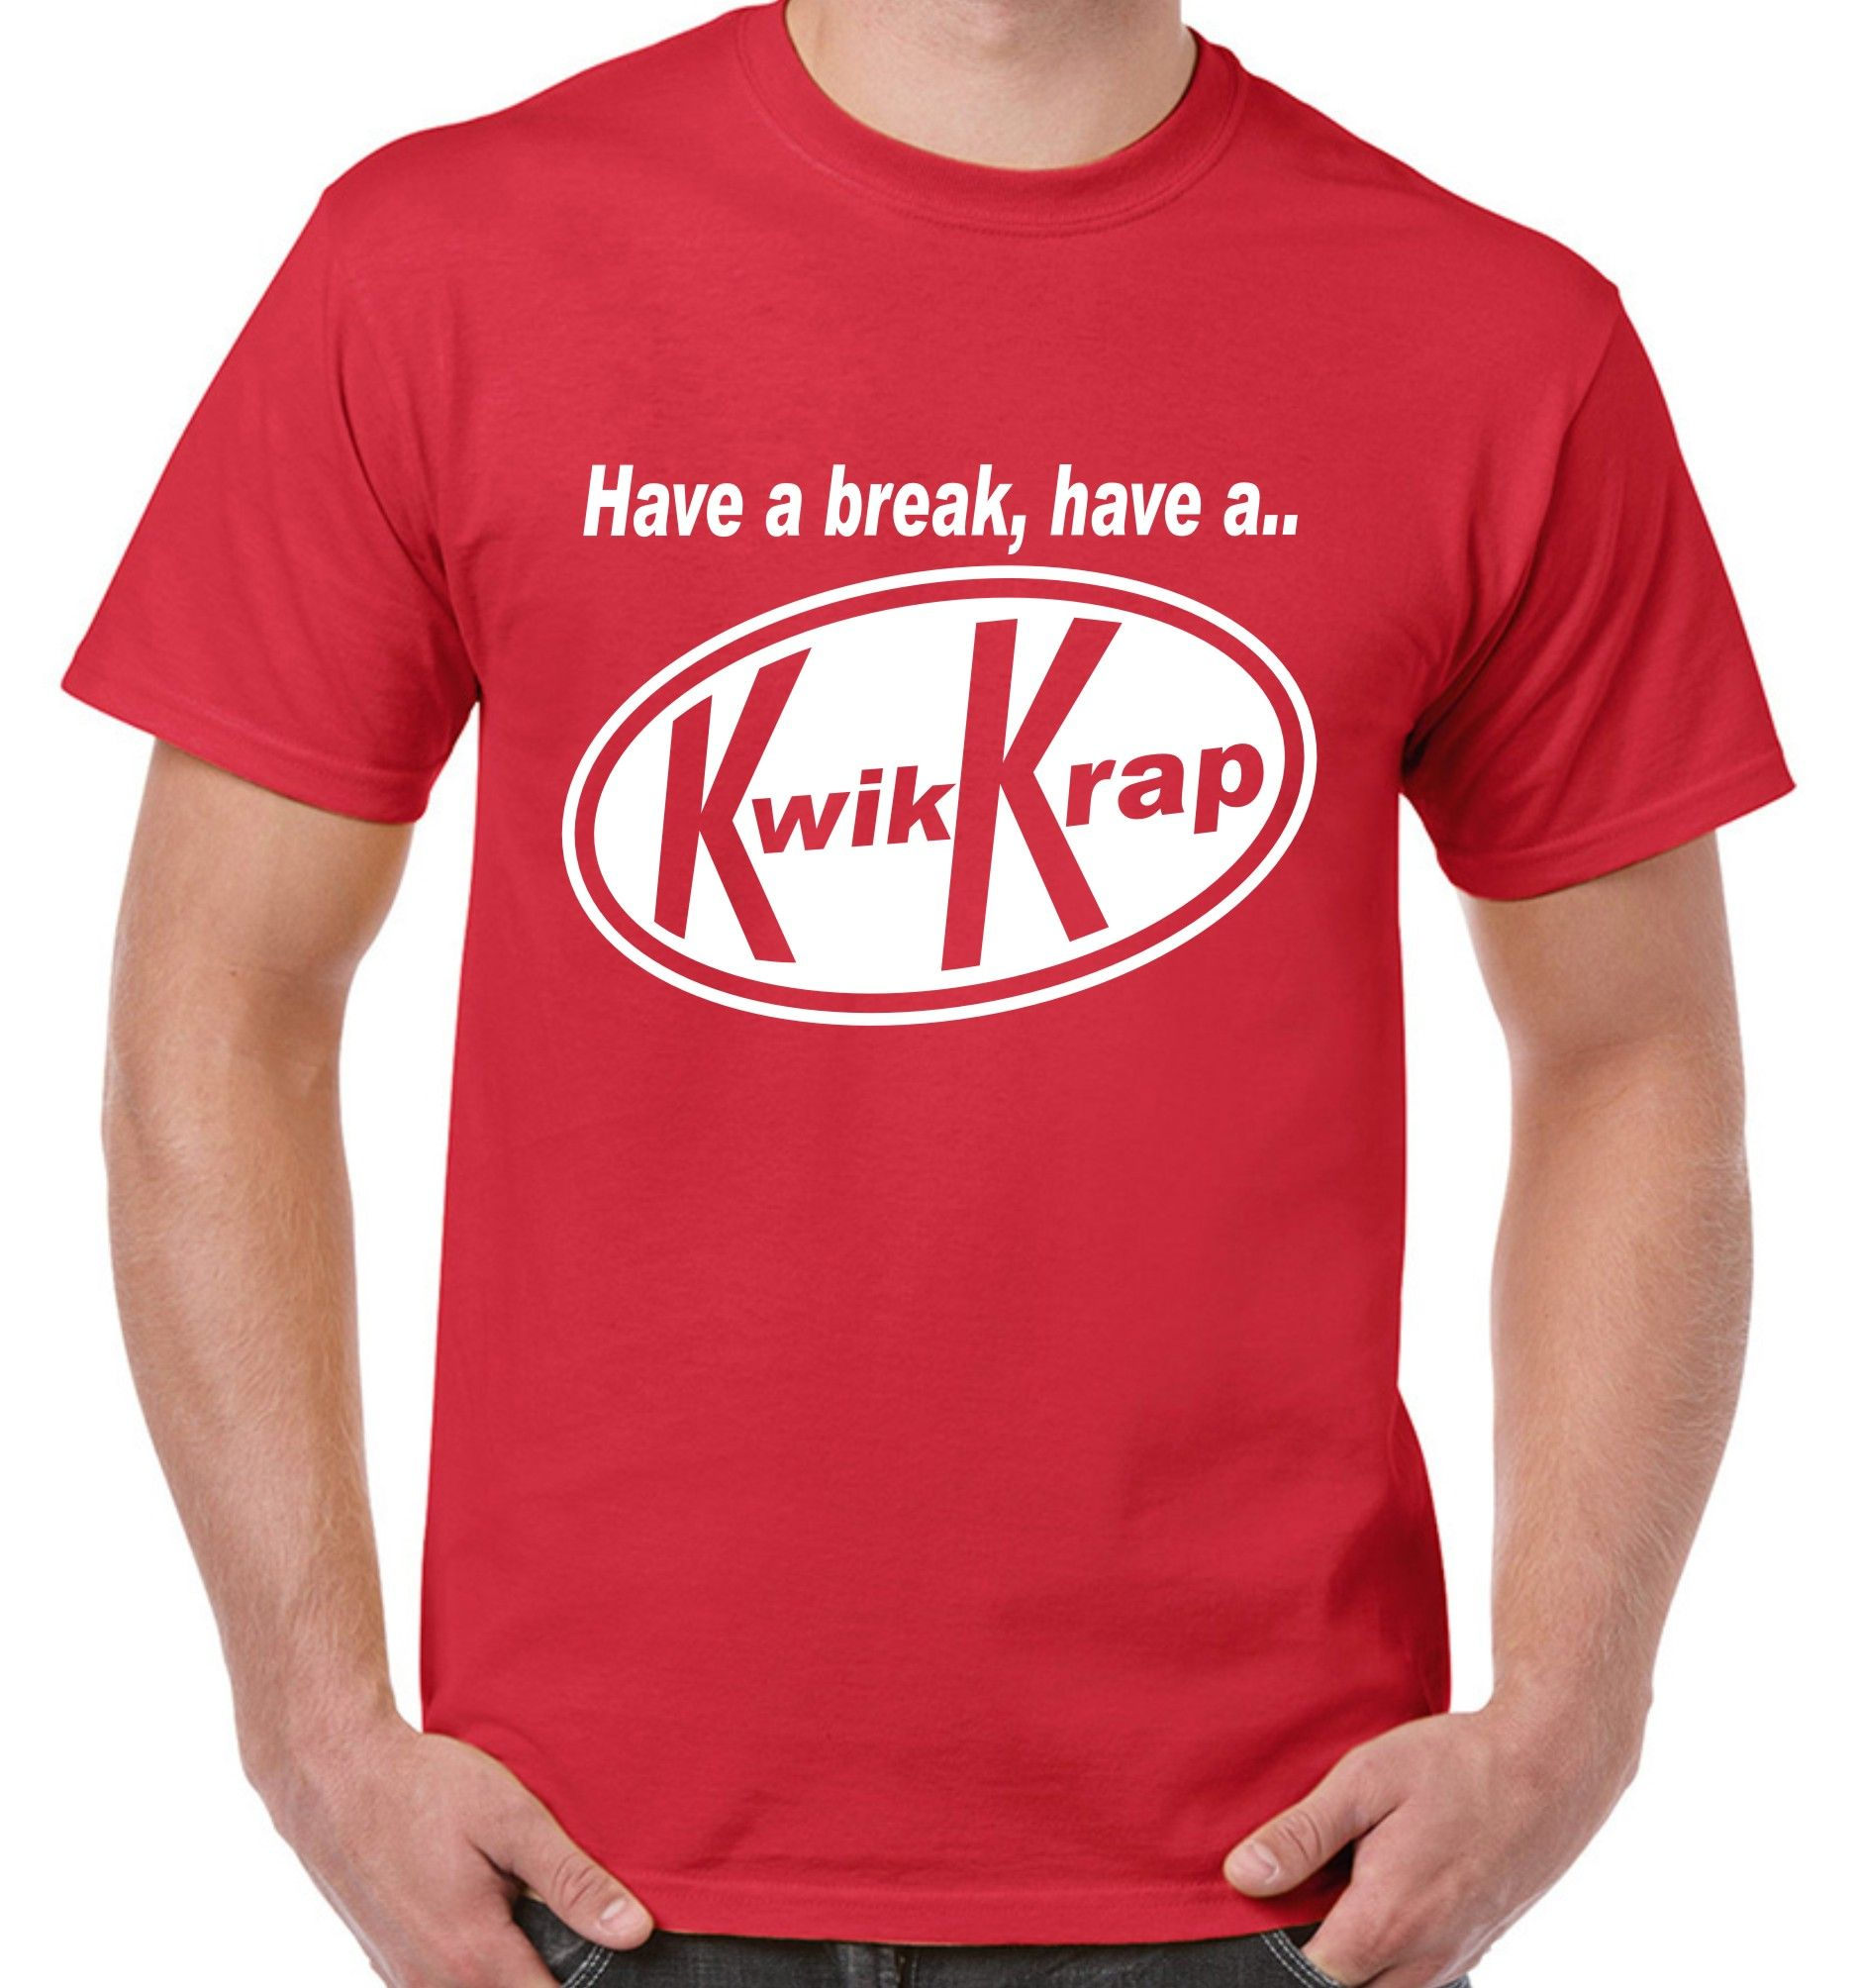 9710b69b Have a break Have a Kwik Krap T shirt | New Designs | Hogwarts t ...